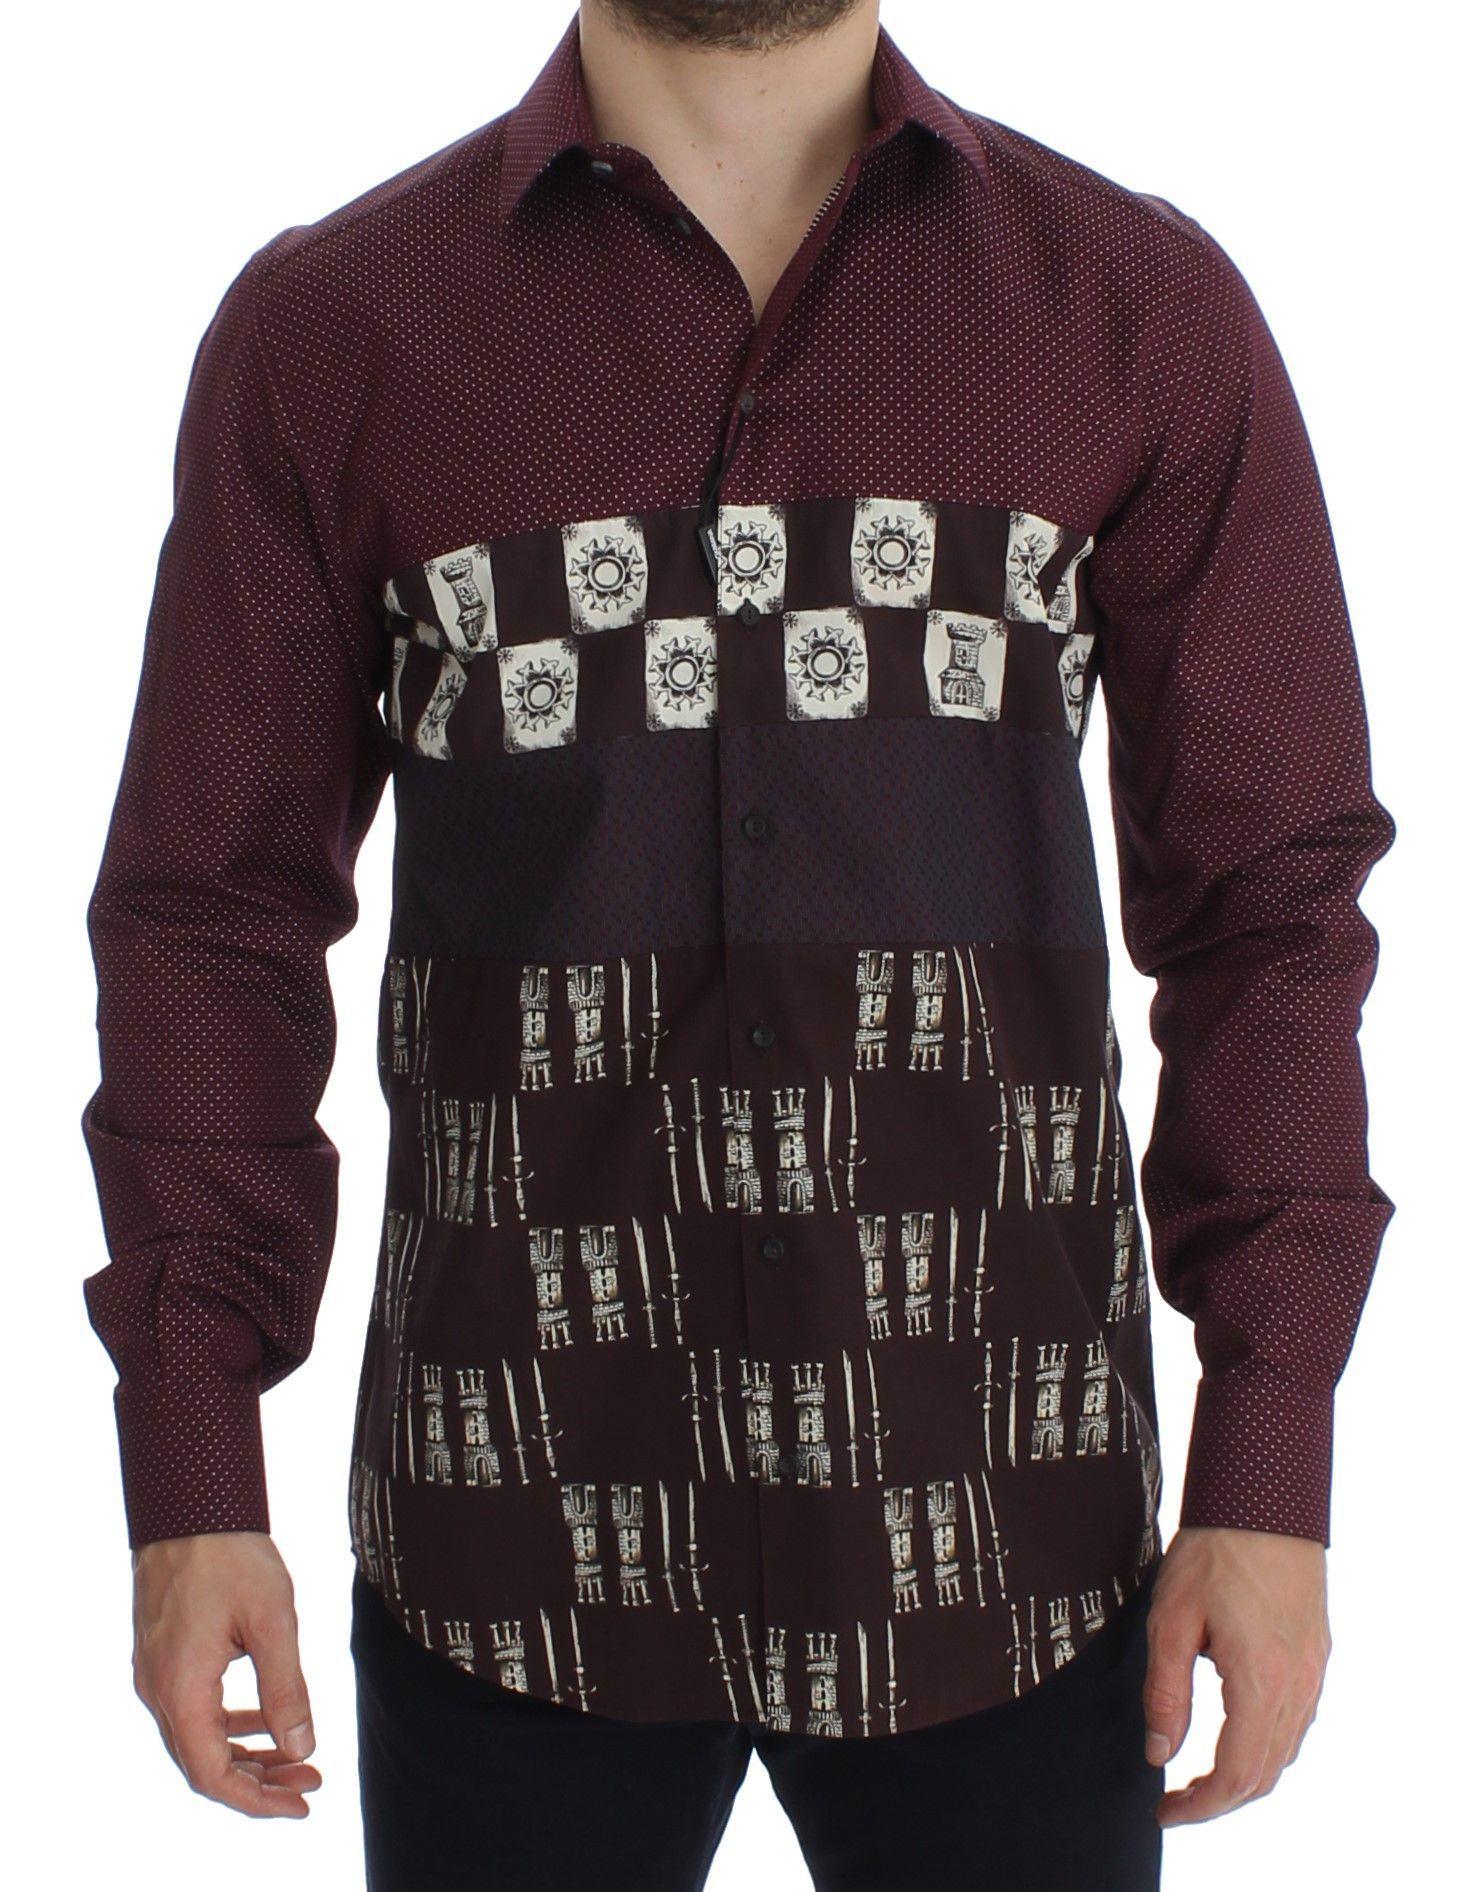 Dolce & Gabbana Bordeaux Medieval Print Slim Fit Casual Shirt